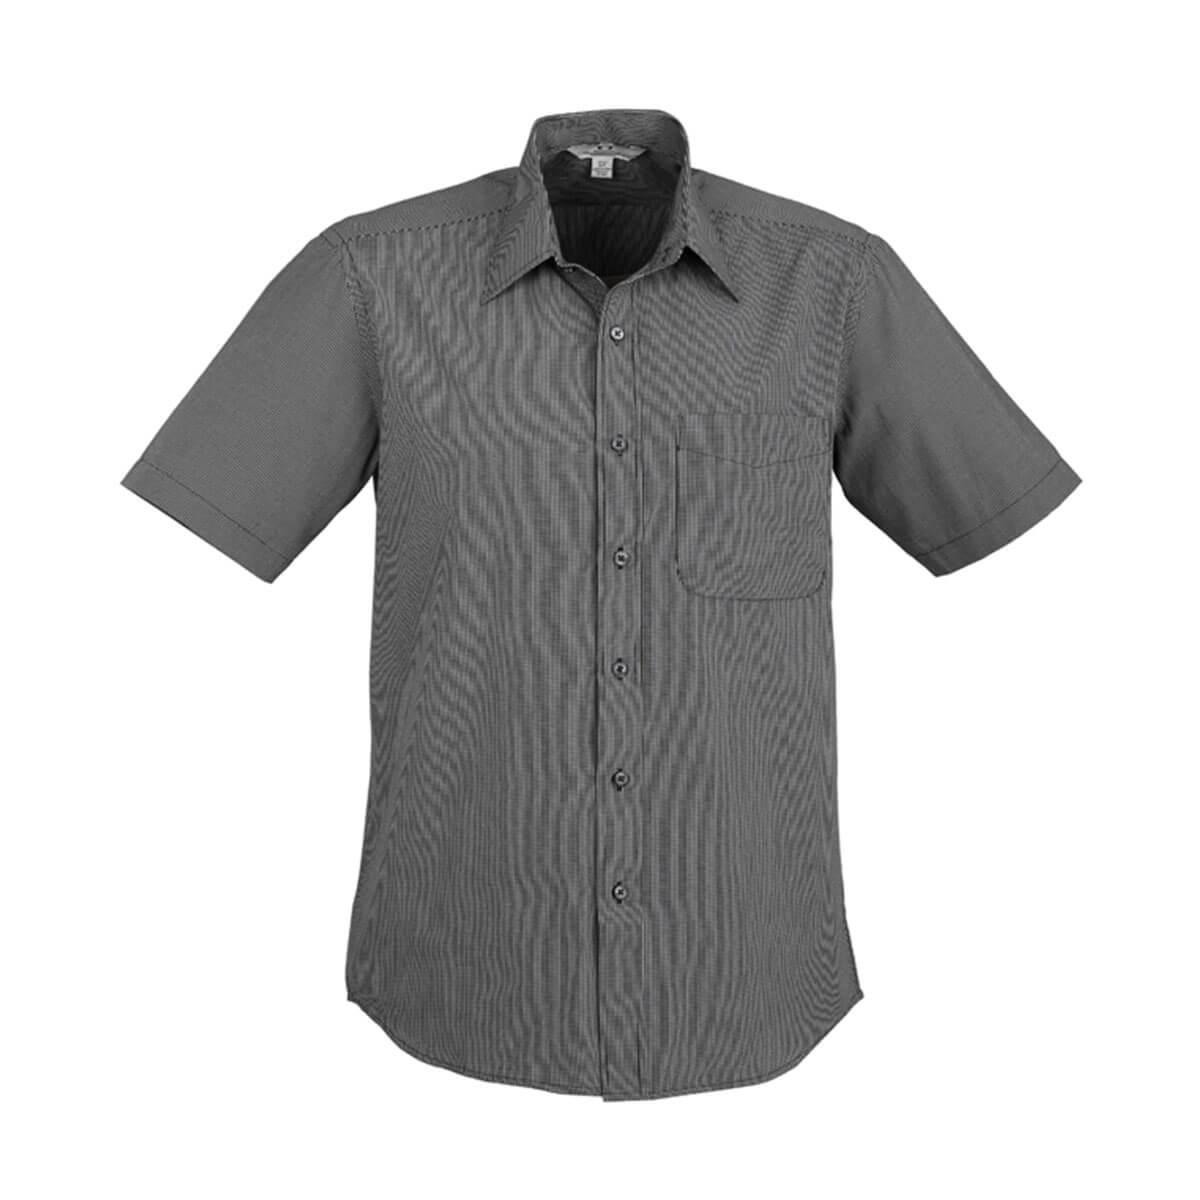 Mens Signature Short Sleeve Shirt-Graphite